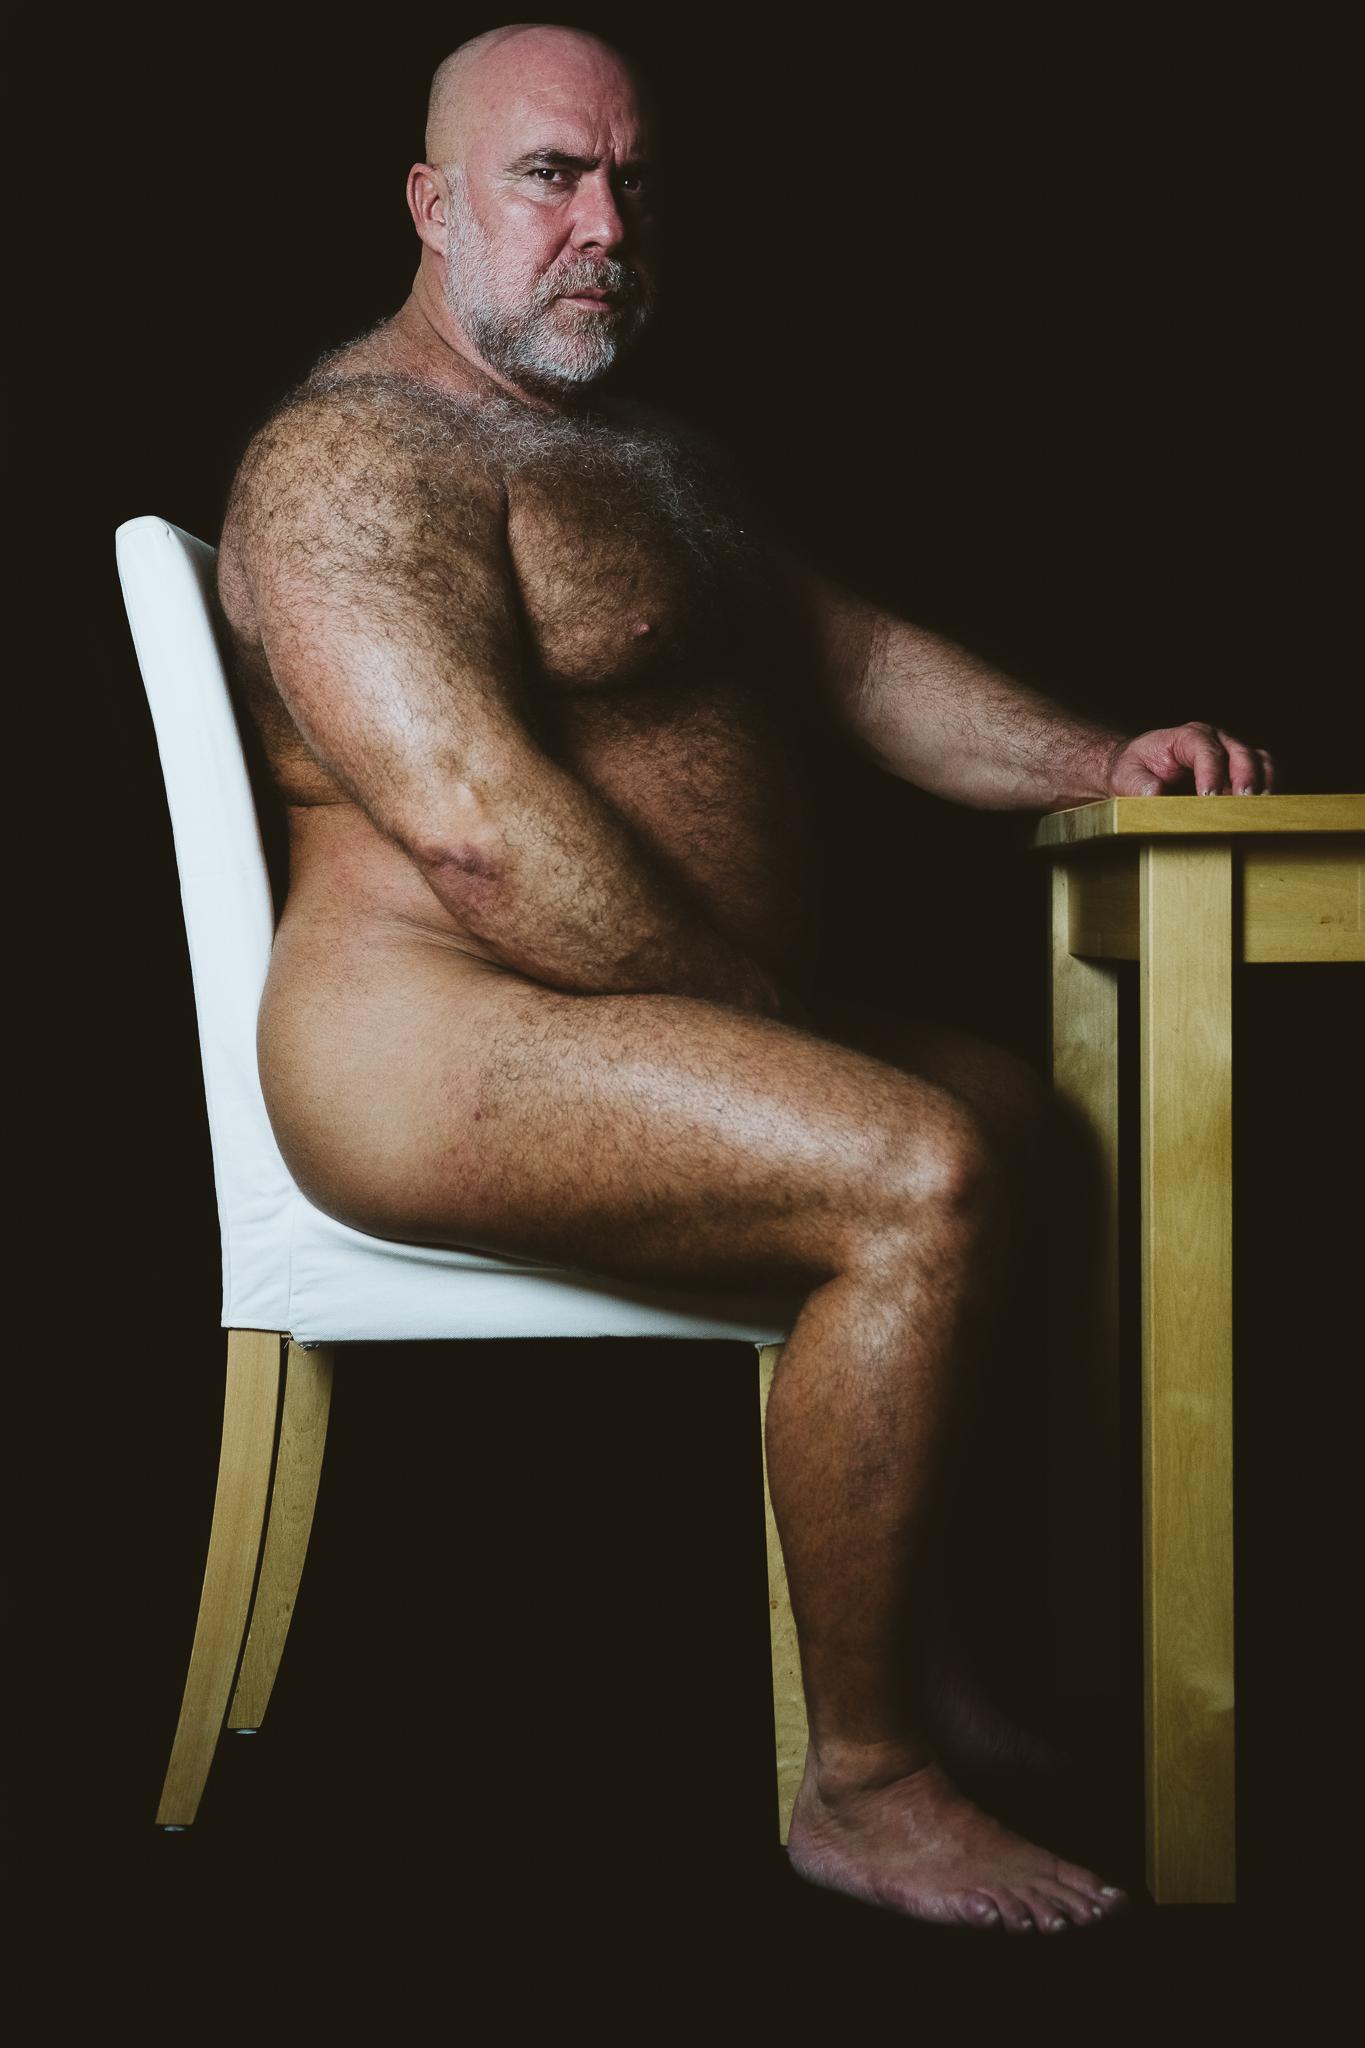 Sexy Sunday Photography Book-20161105-untitled-1828261.jpg